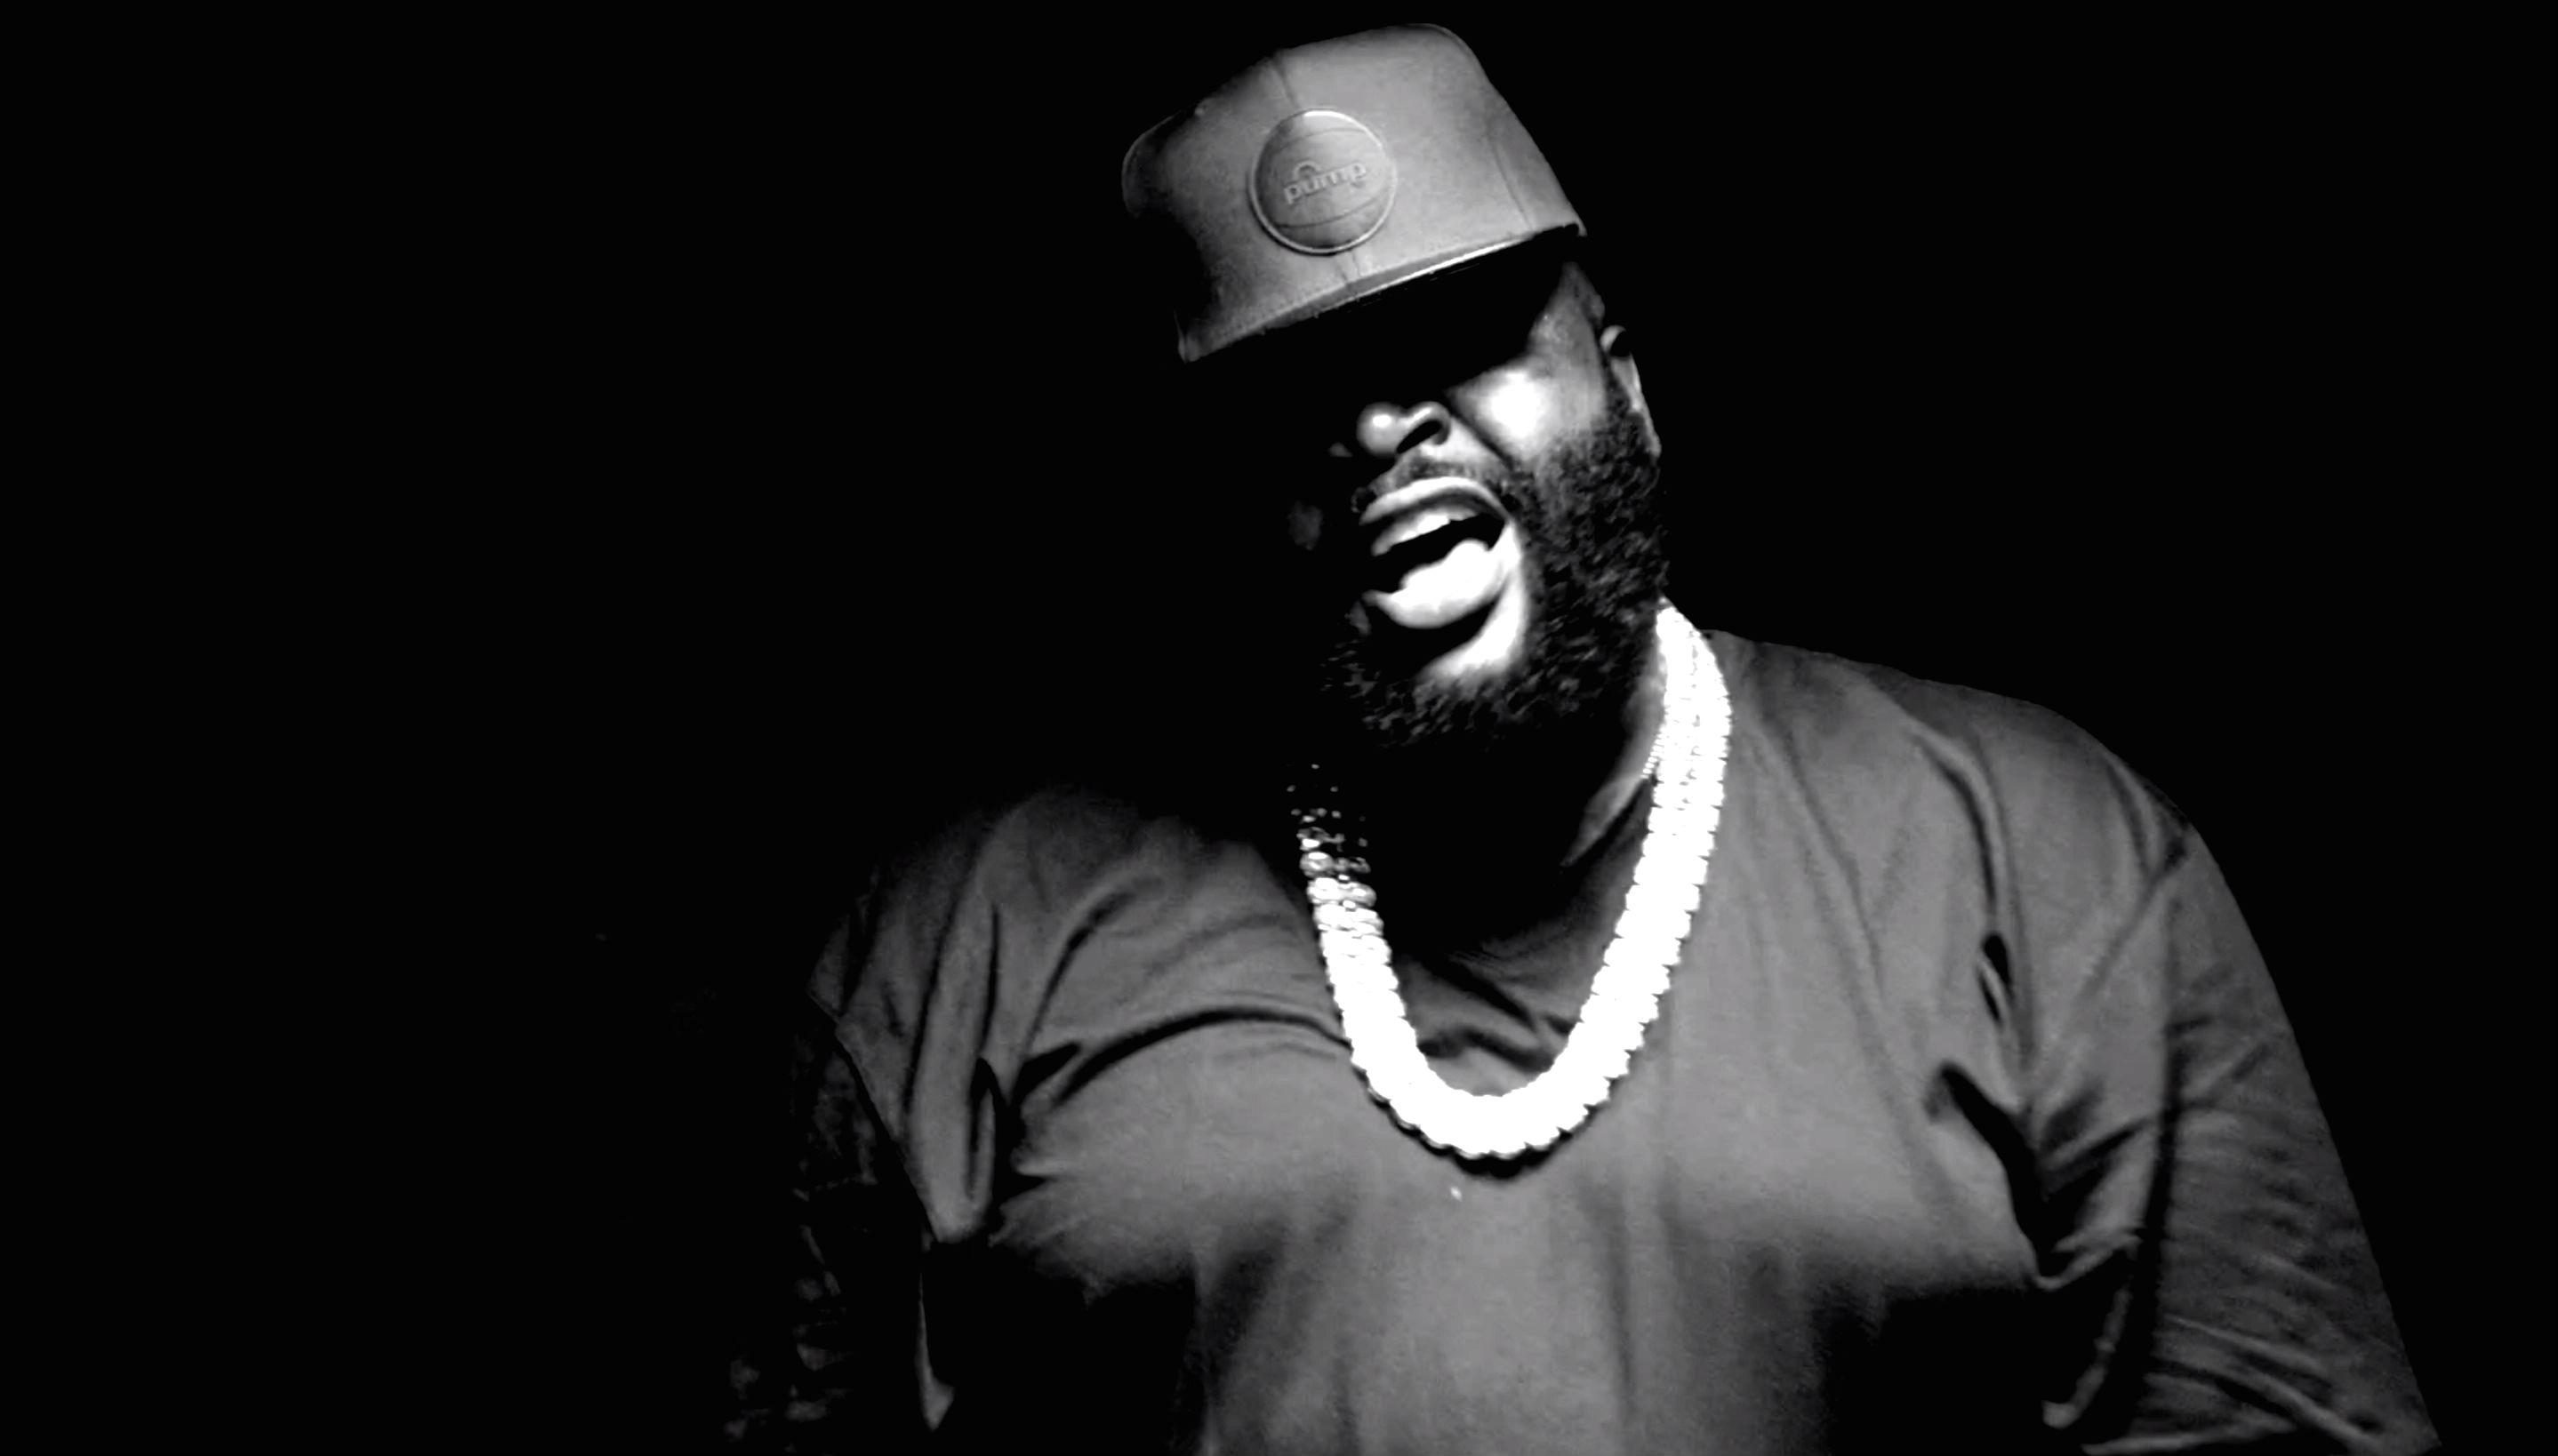 RICK ROSS gangsta rapper rap hip hop ej wallpaper 2877x1638 181178 2877x1638